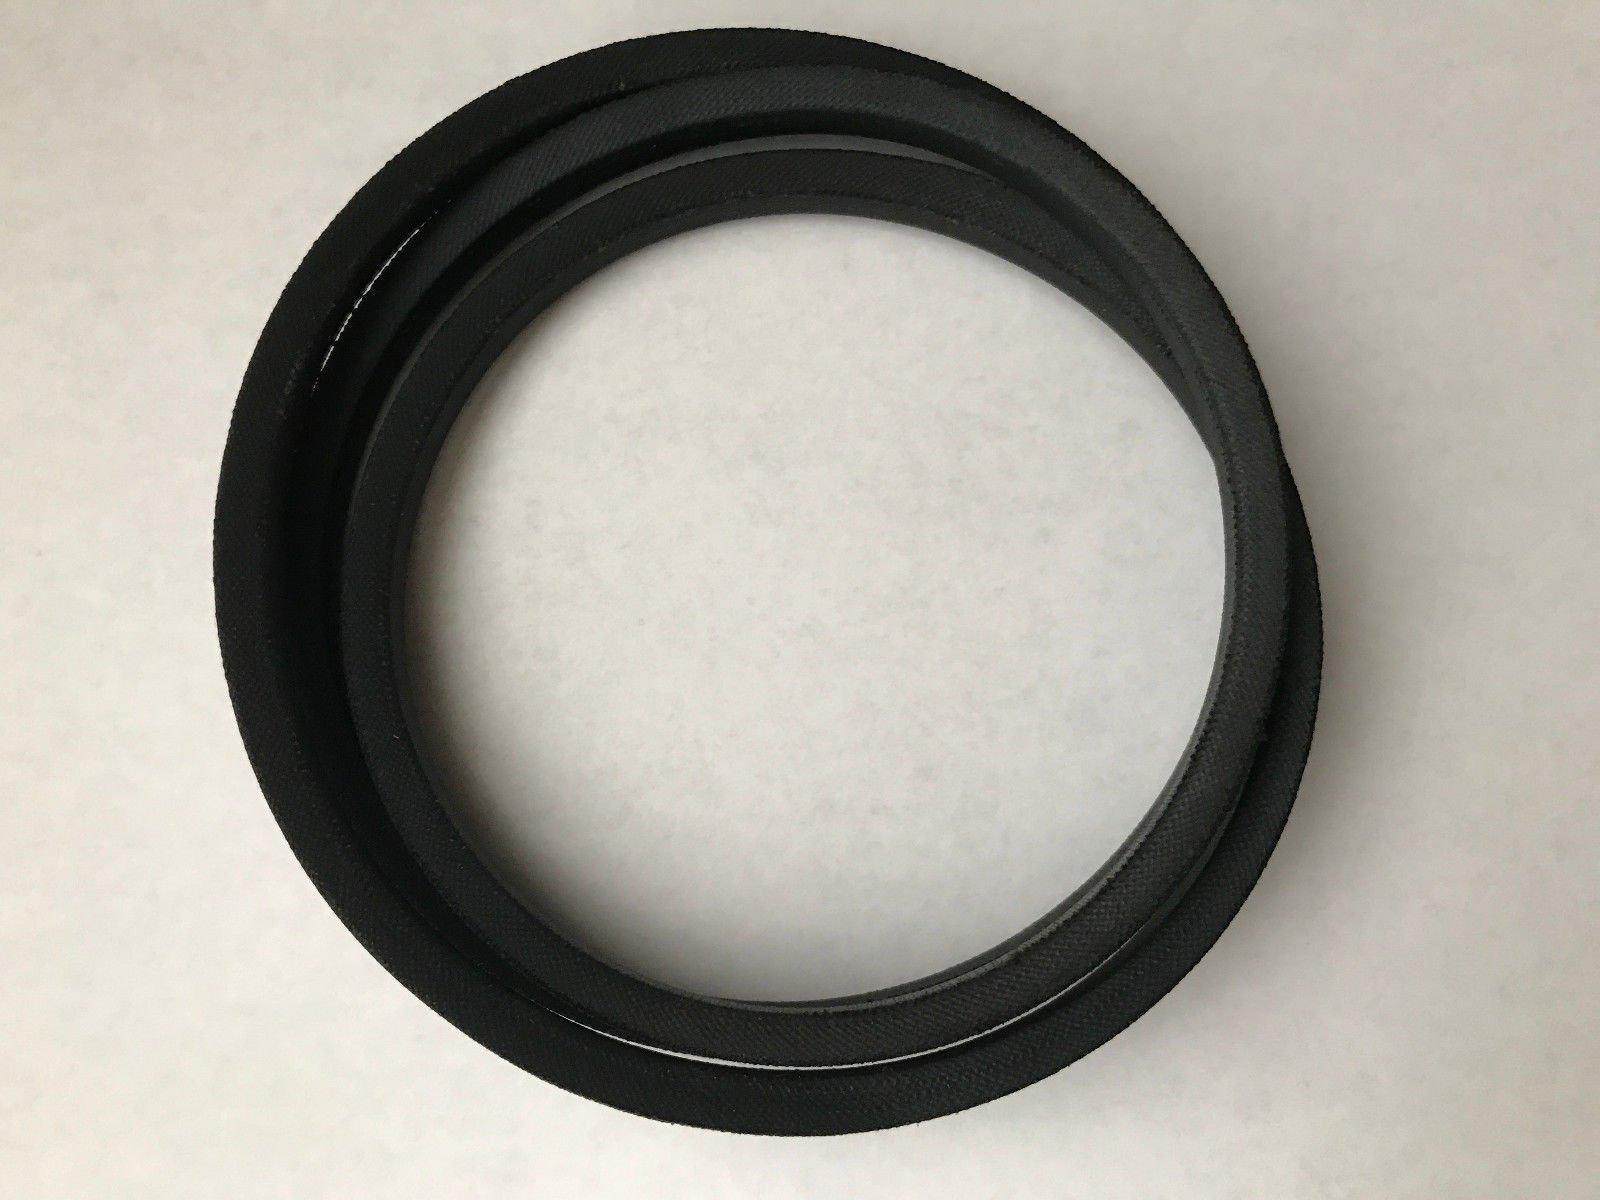 New Belt Craftsman 917.773744 917773744 Grass/Weed Trimmer Belt # 532185476